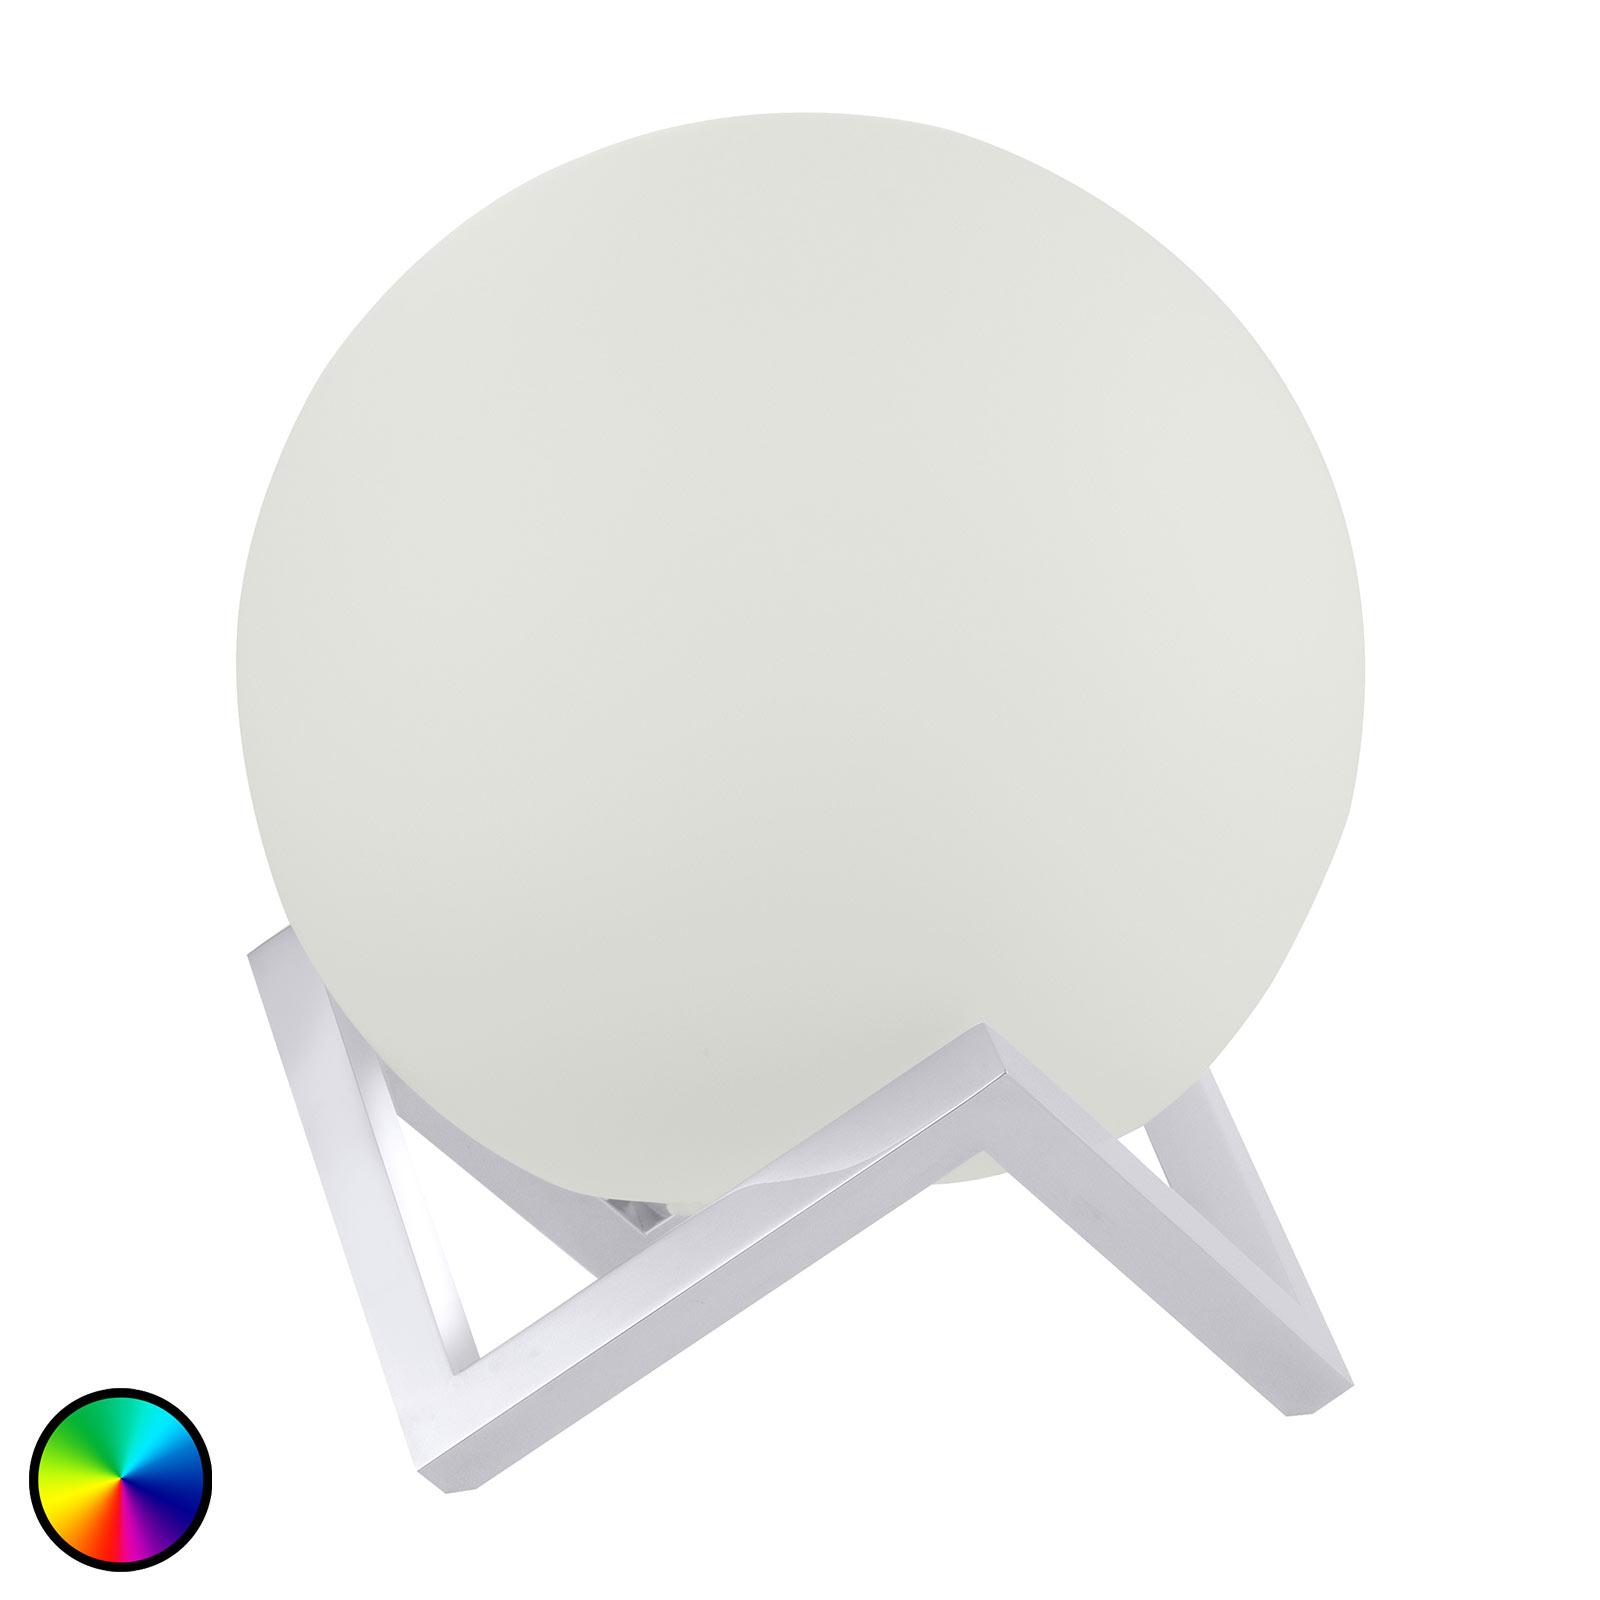 Paul Neuhaus Q-MANUEL lampe à poser LED RGBW CCT